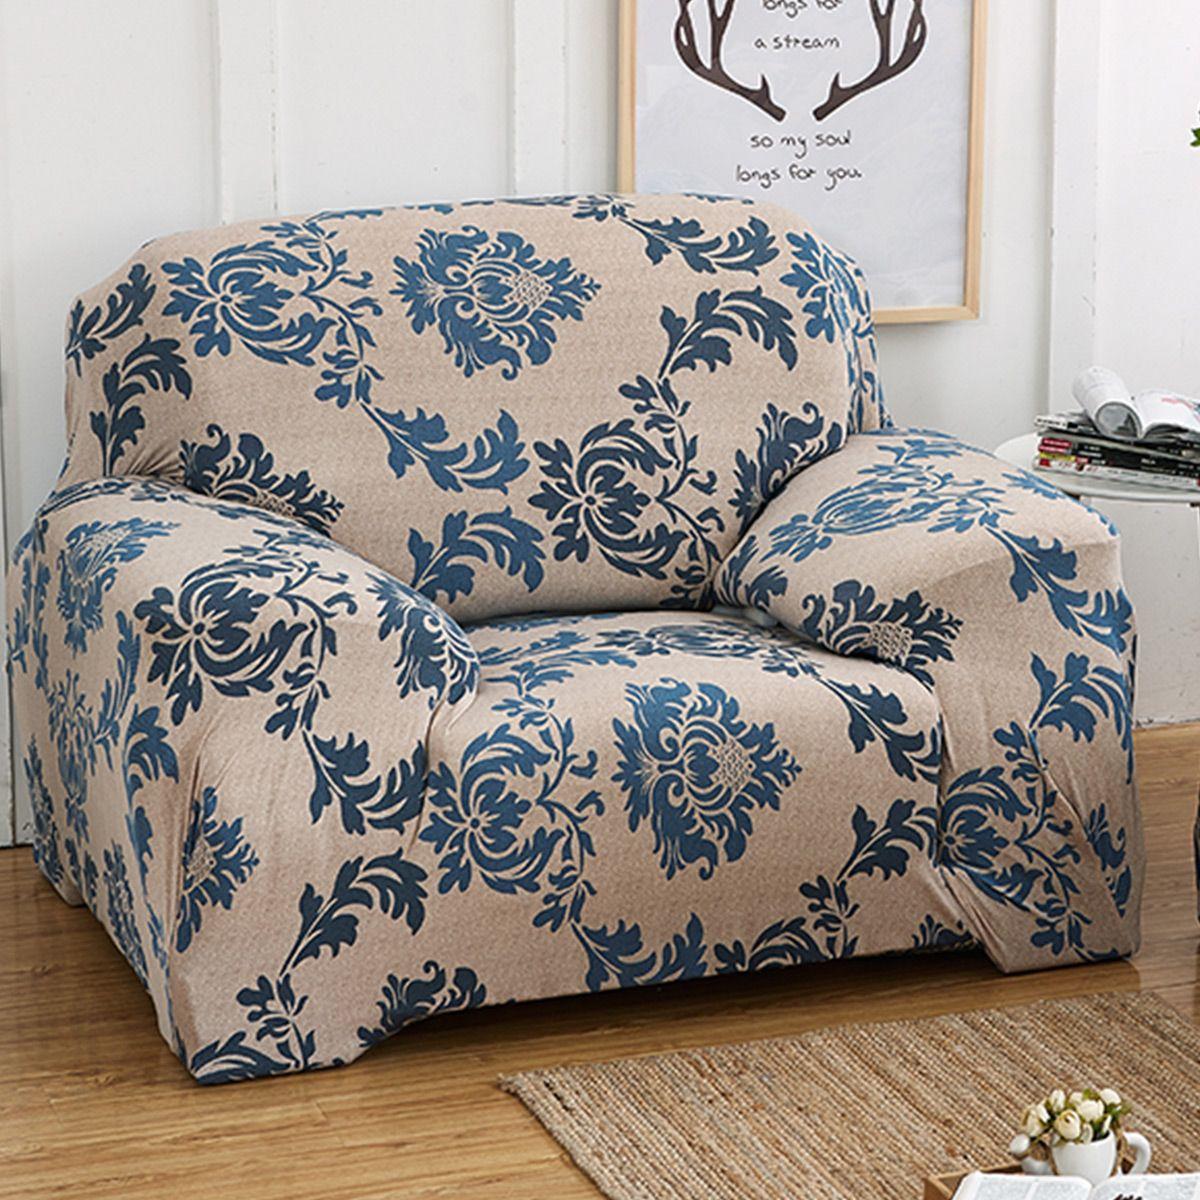 Stretch Fabric One Seater L Shape, TKOOFN Elastic Sofa ...